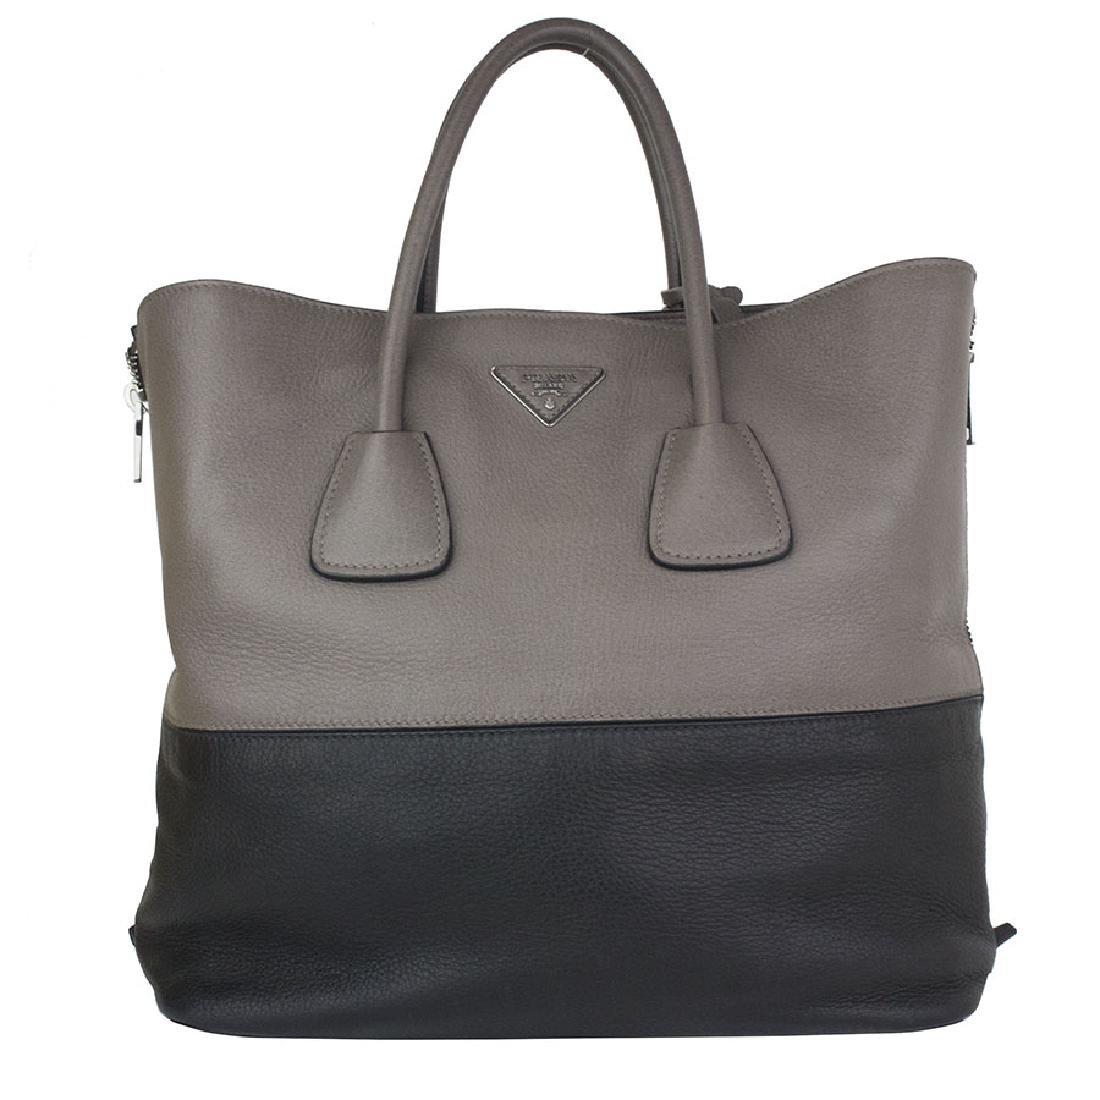 reduced prada daino naturale textured leather shopping tote bag 26b63 a621c 344bd197c80c2